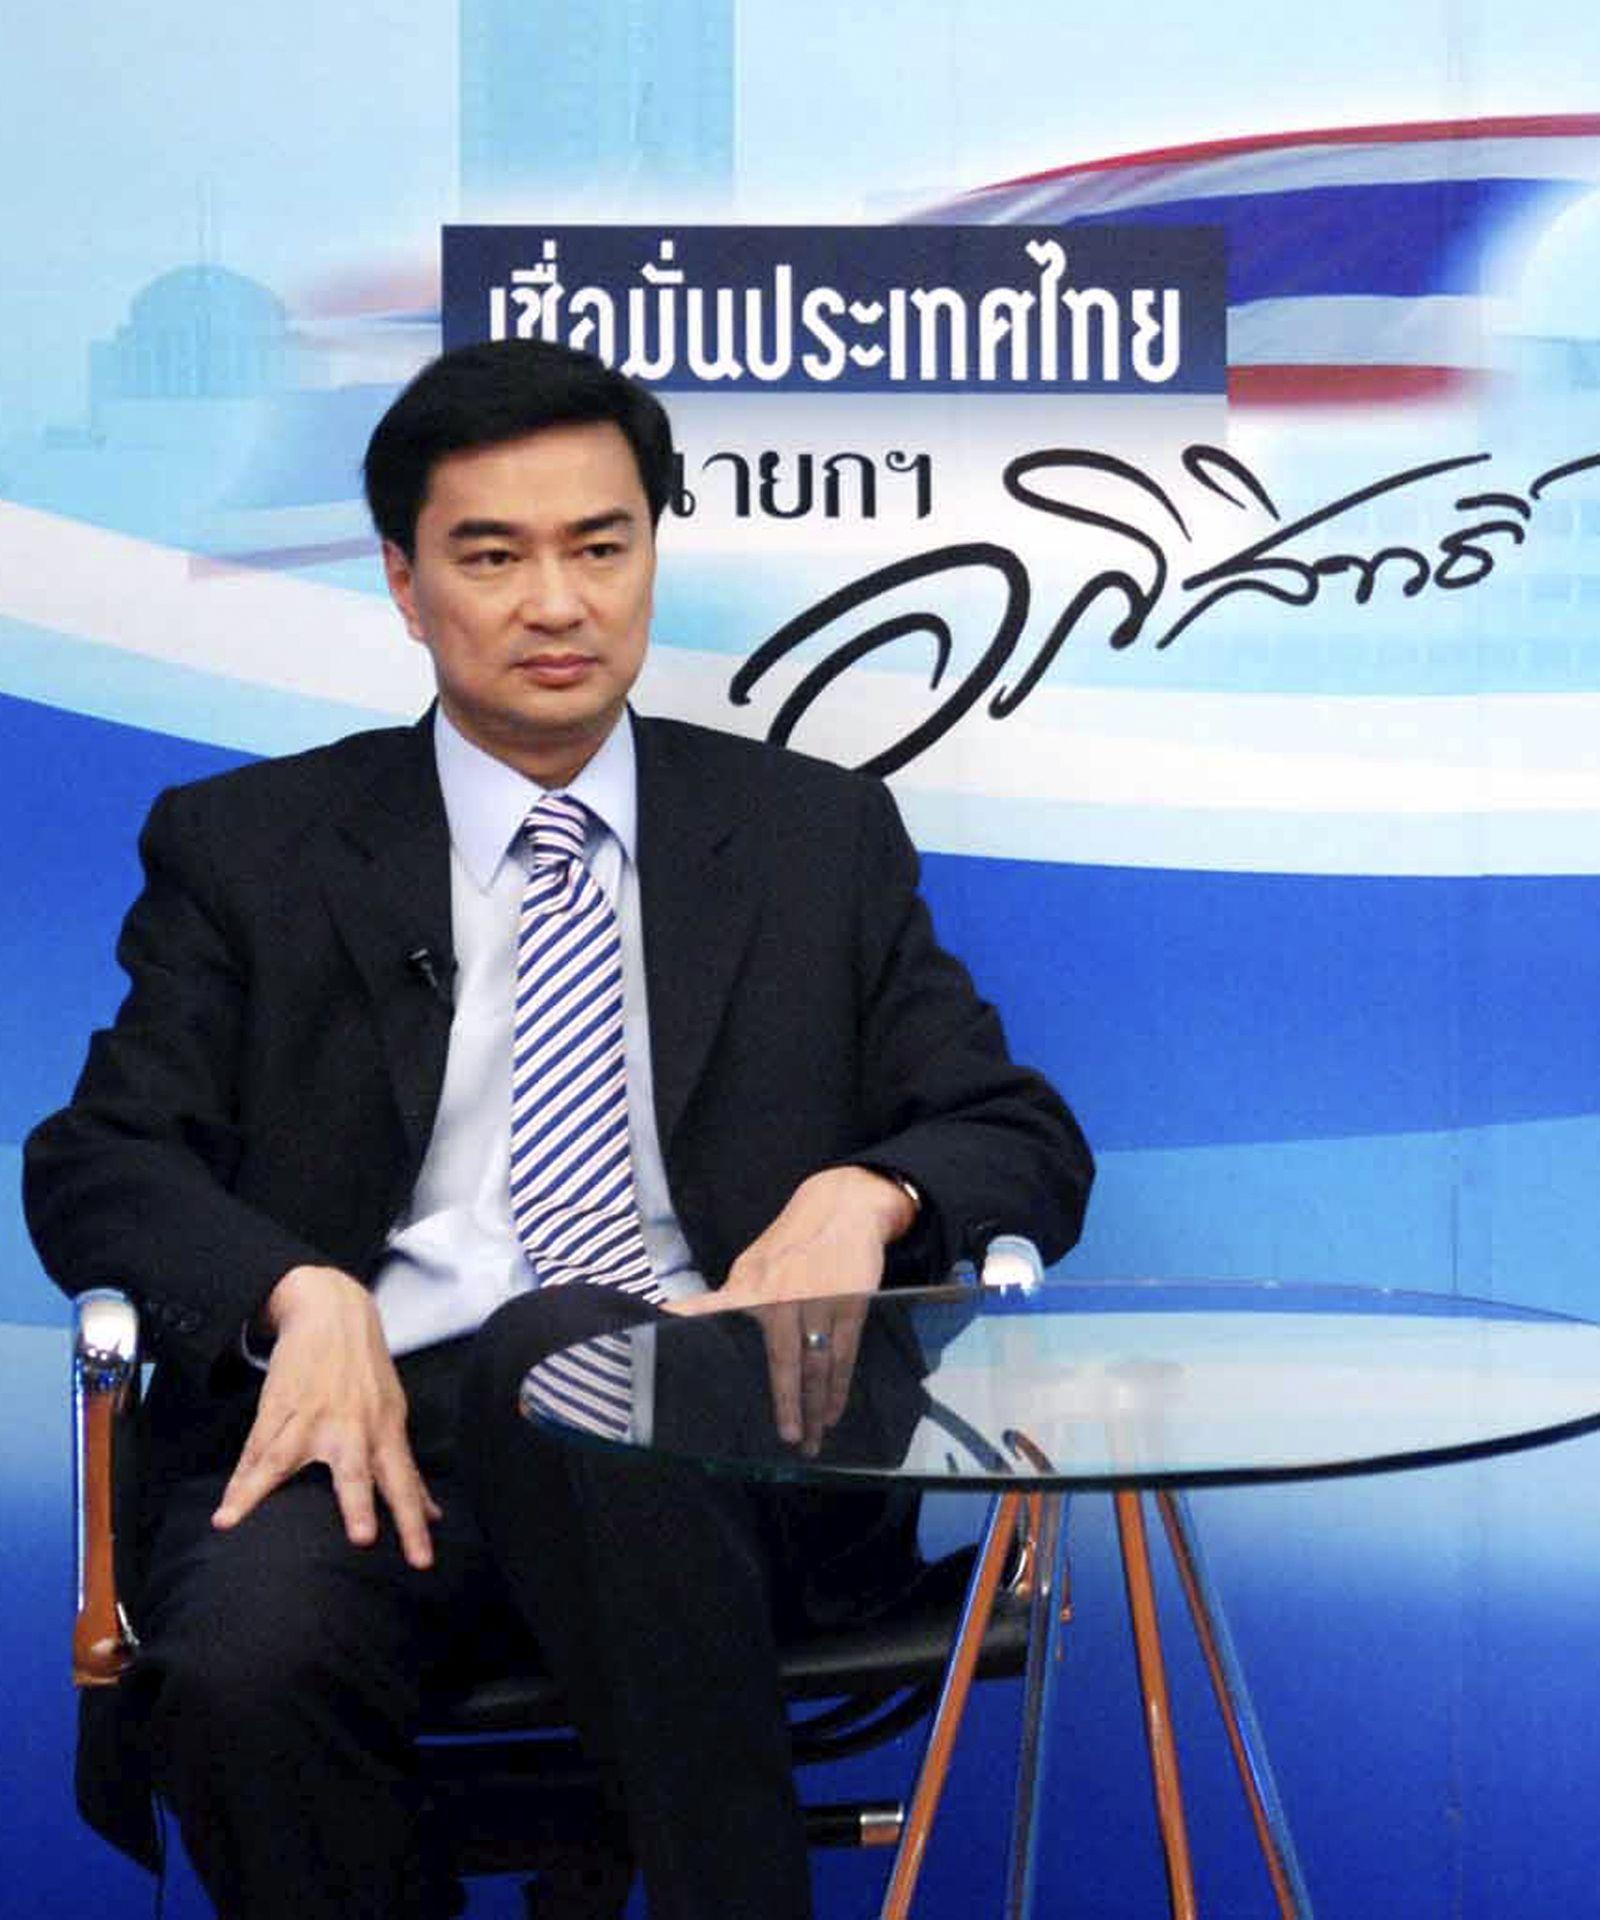 THAILAND / Abhisit Vejjajiva